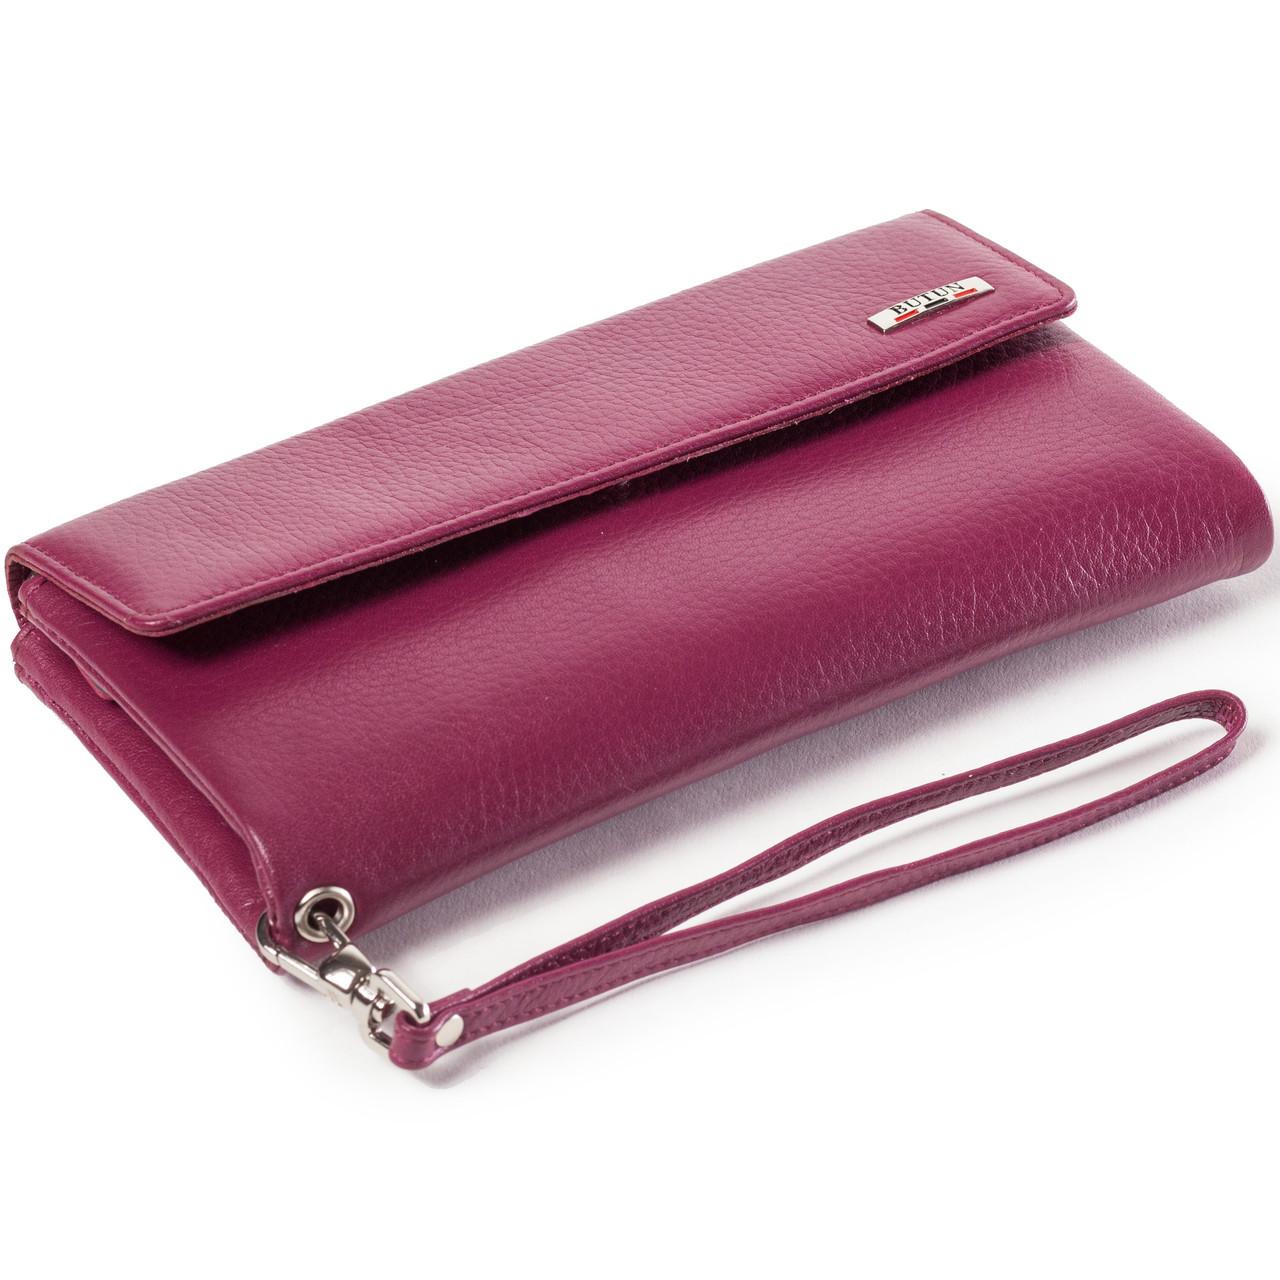 Женский кошелек клатч кожаный марсала BUTUN 624-004-005